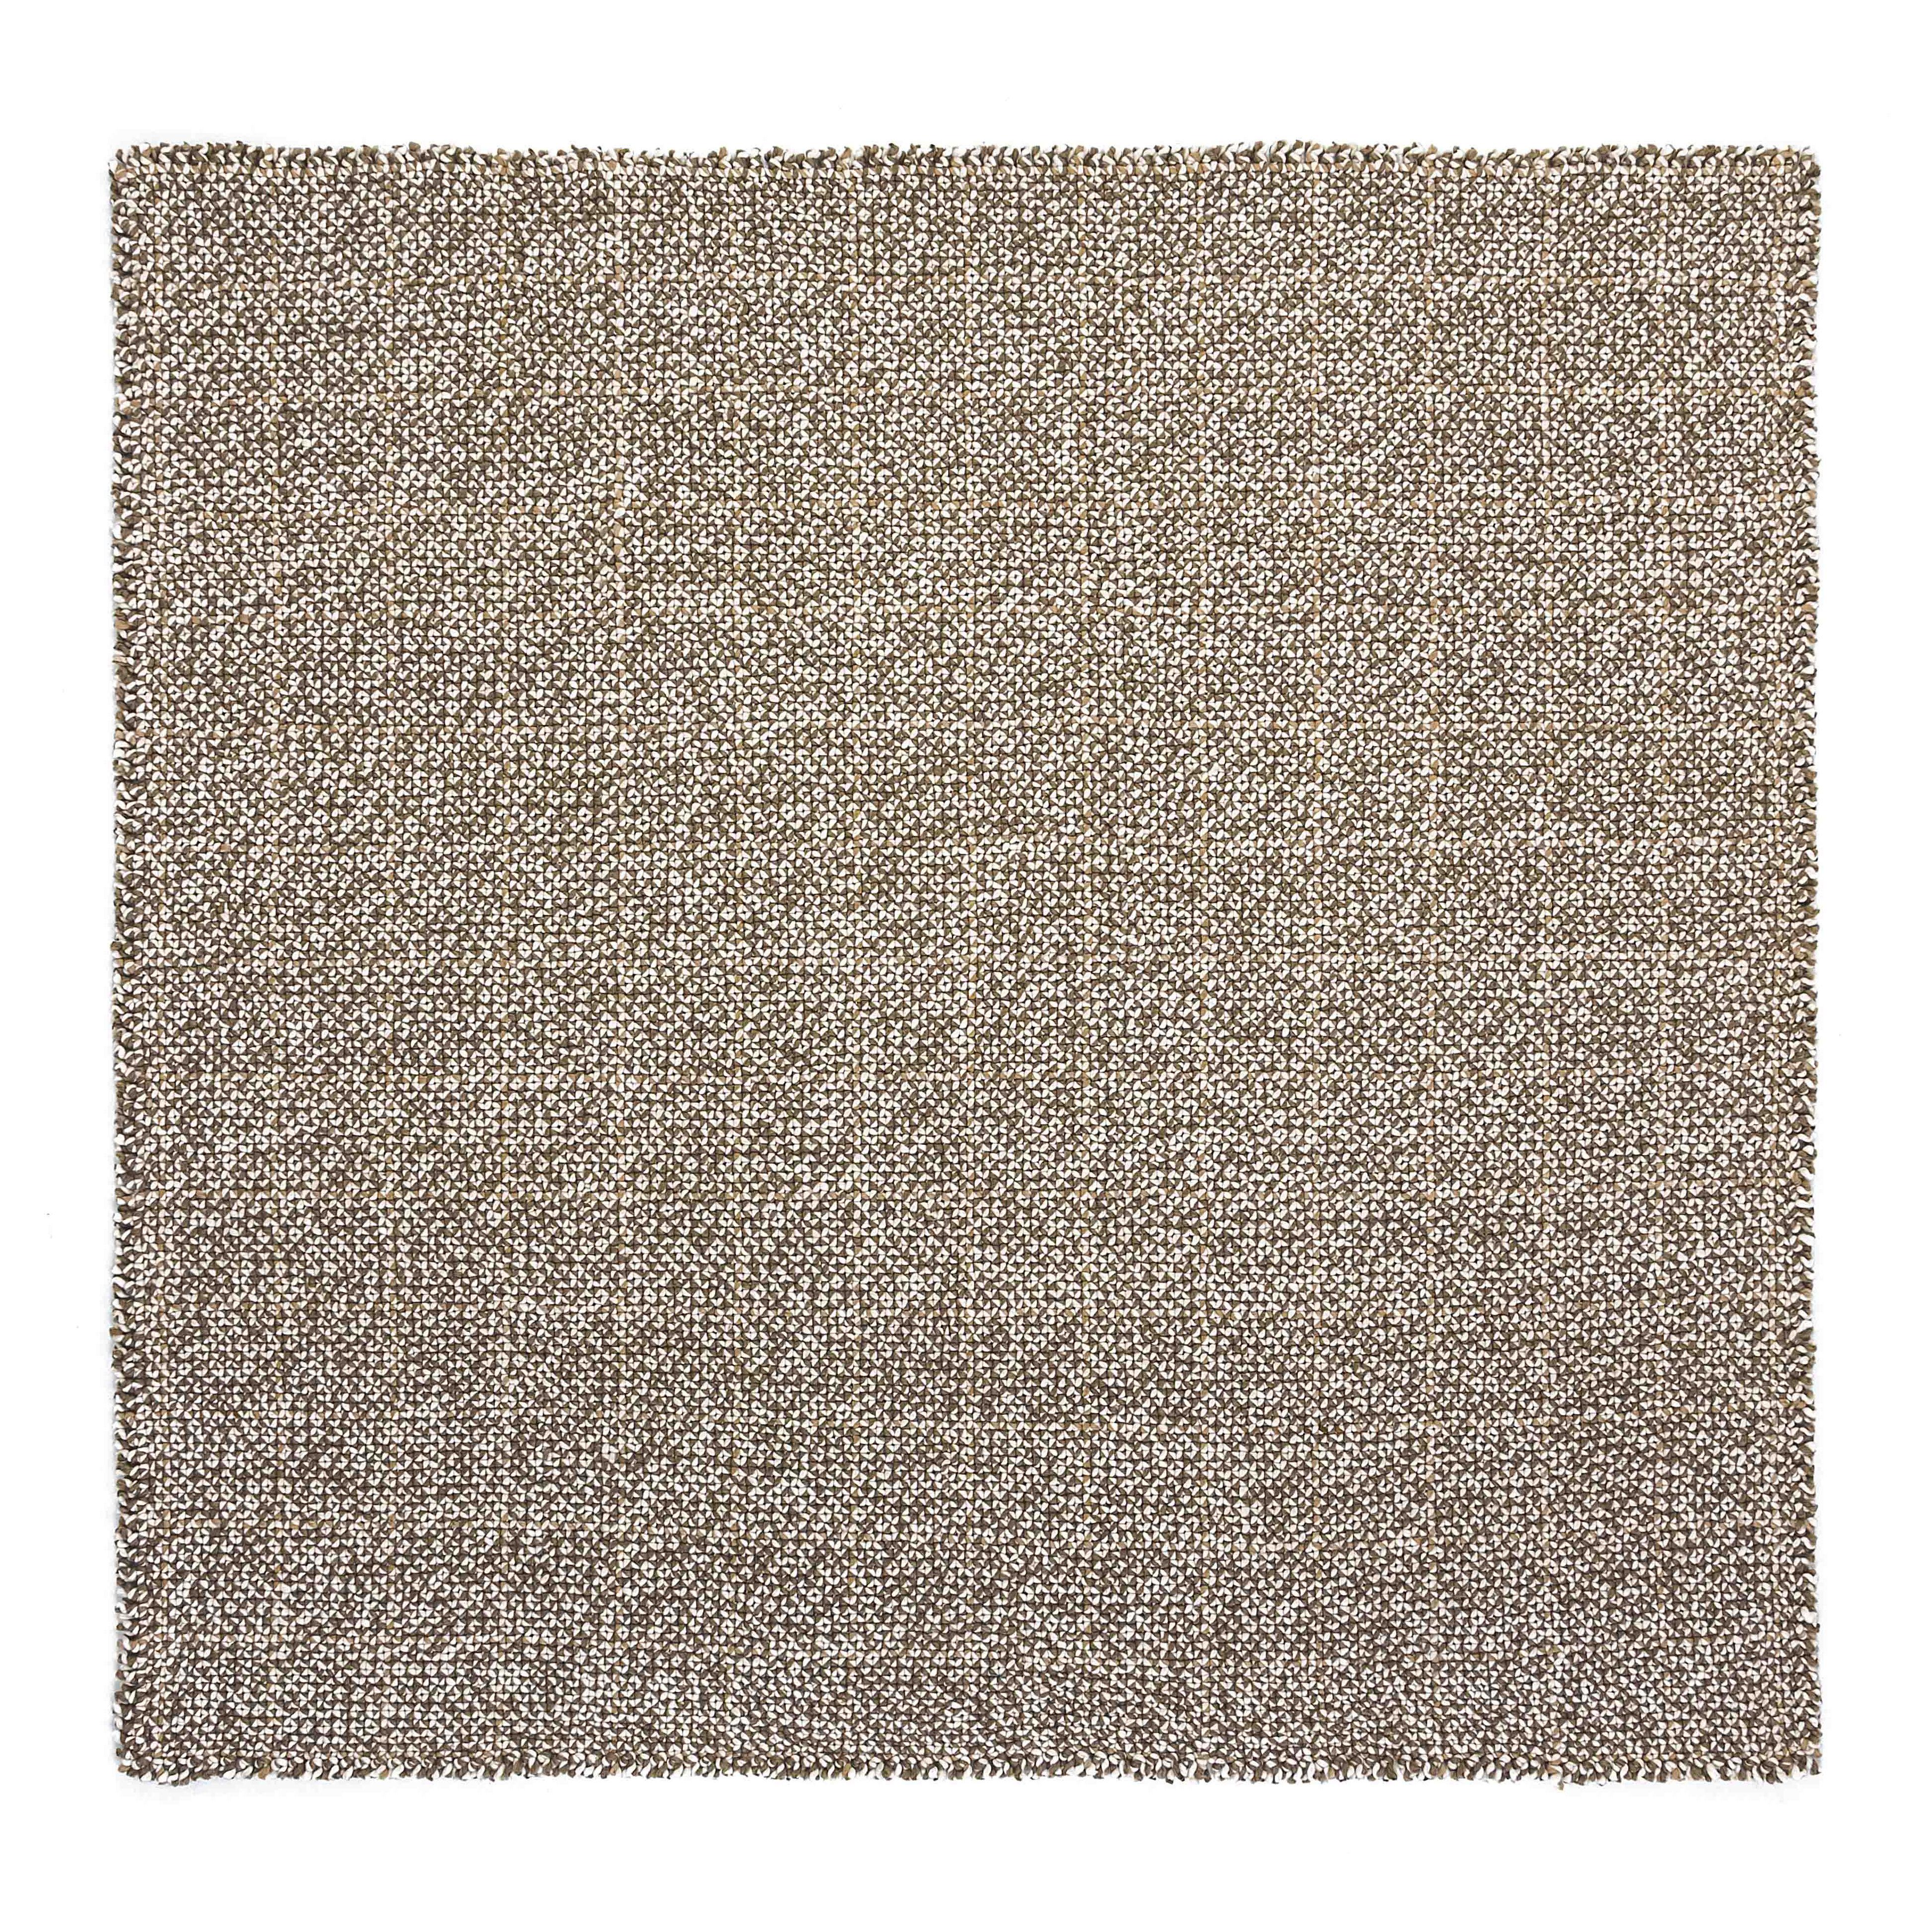 Tapis waan 170 x 240 cm laine taupe gan made in design - Made in design tapis ...